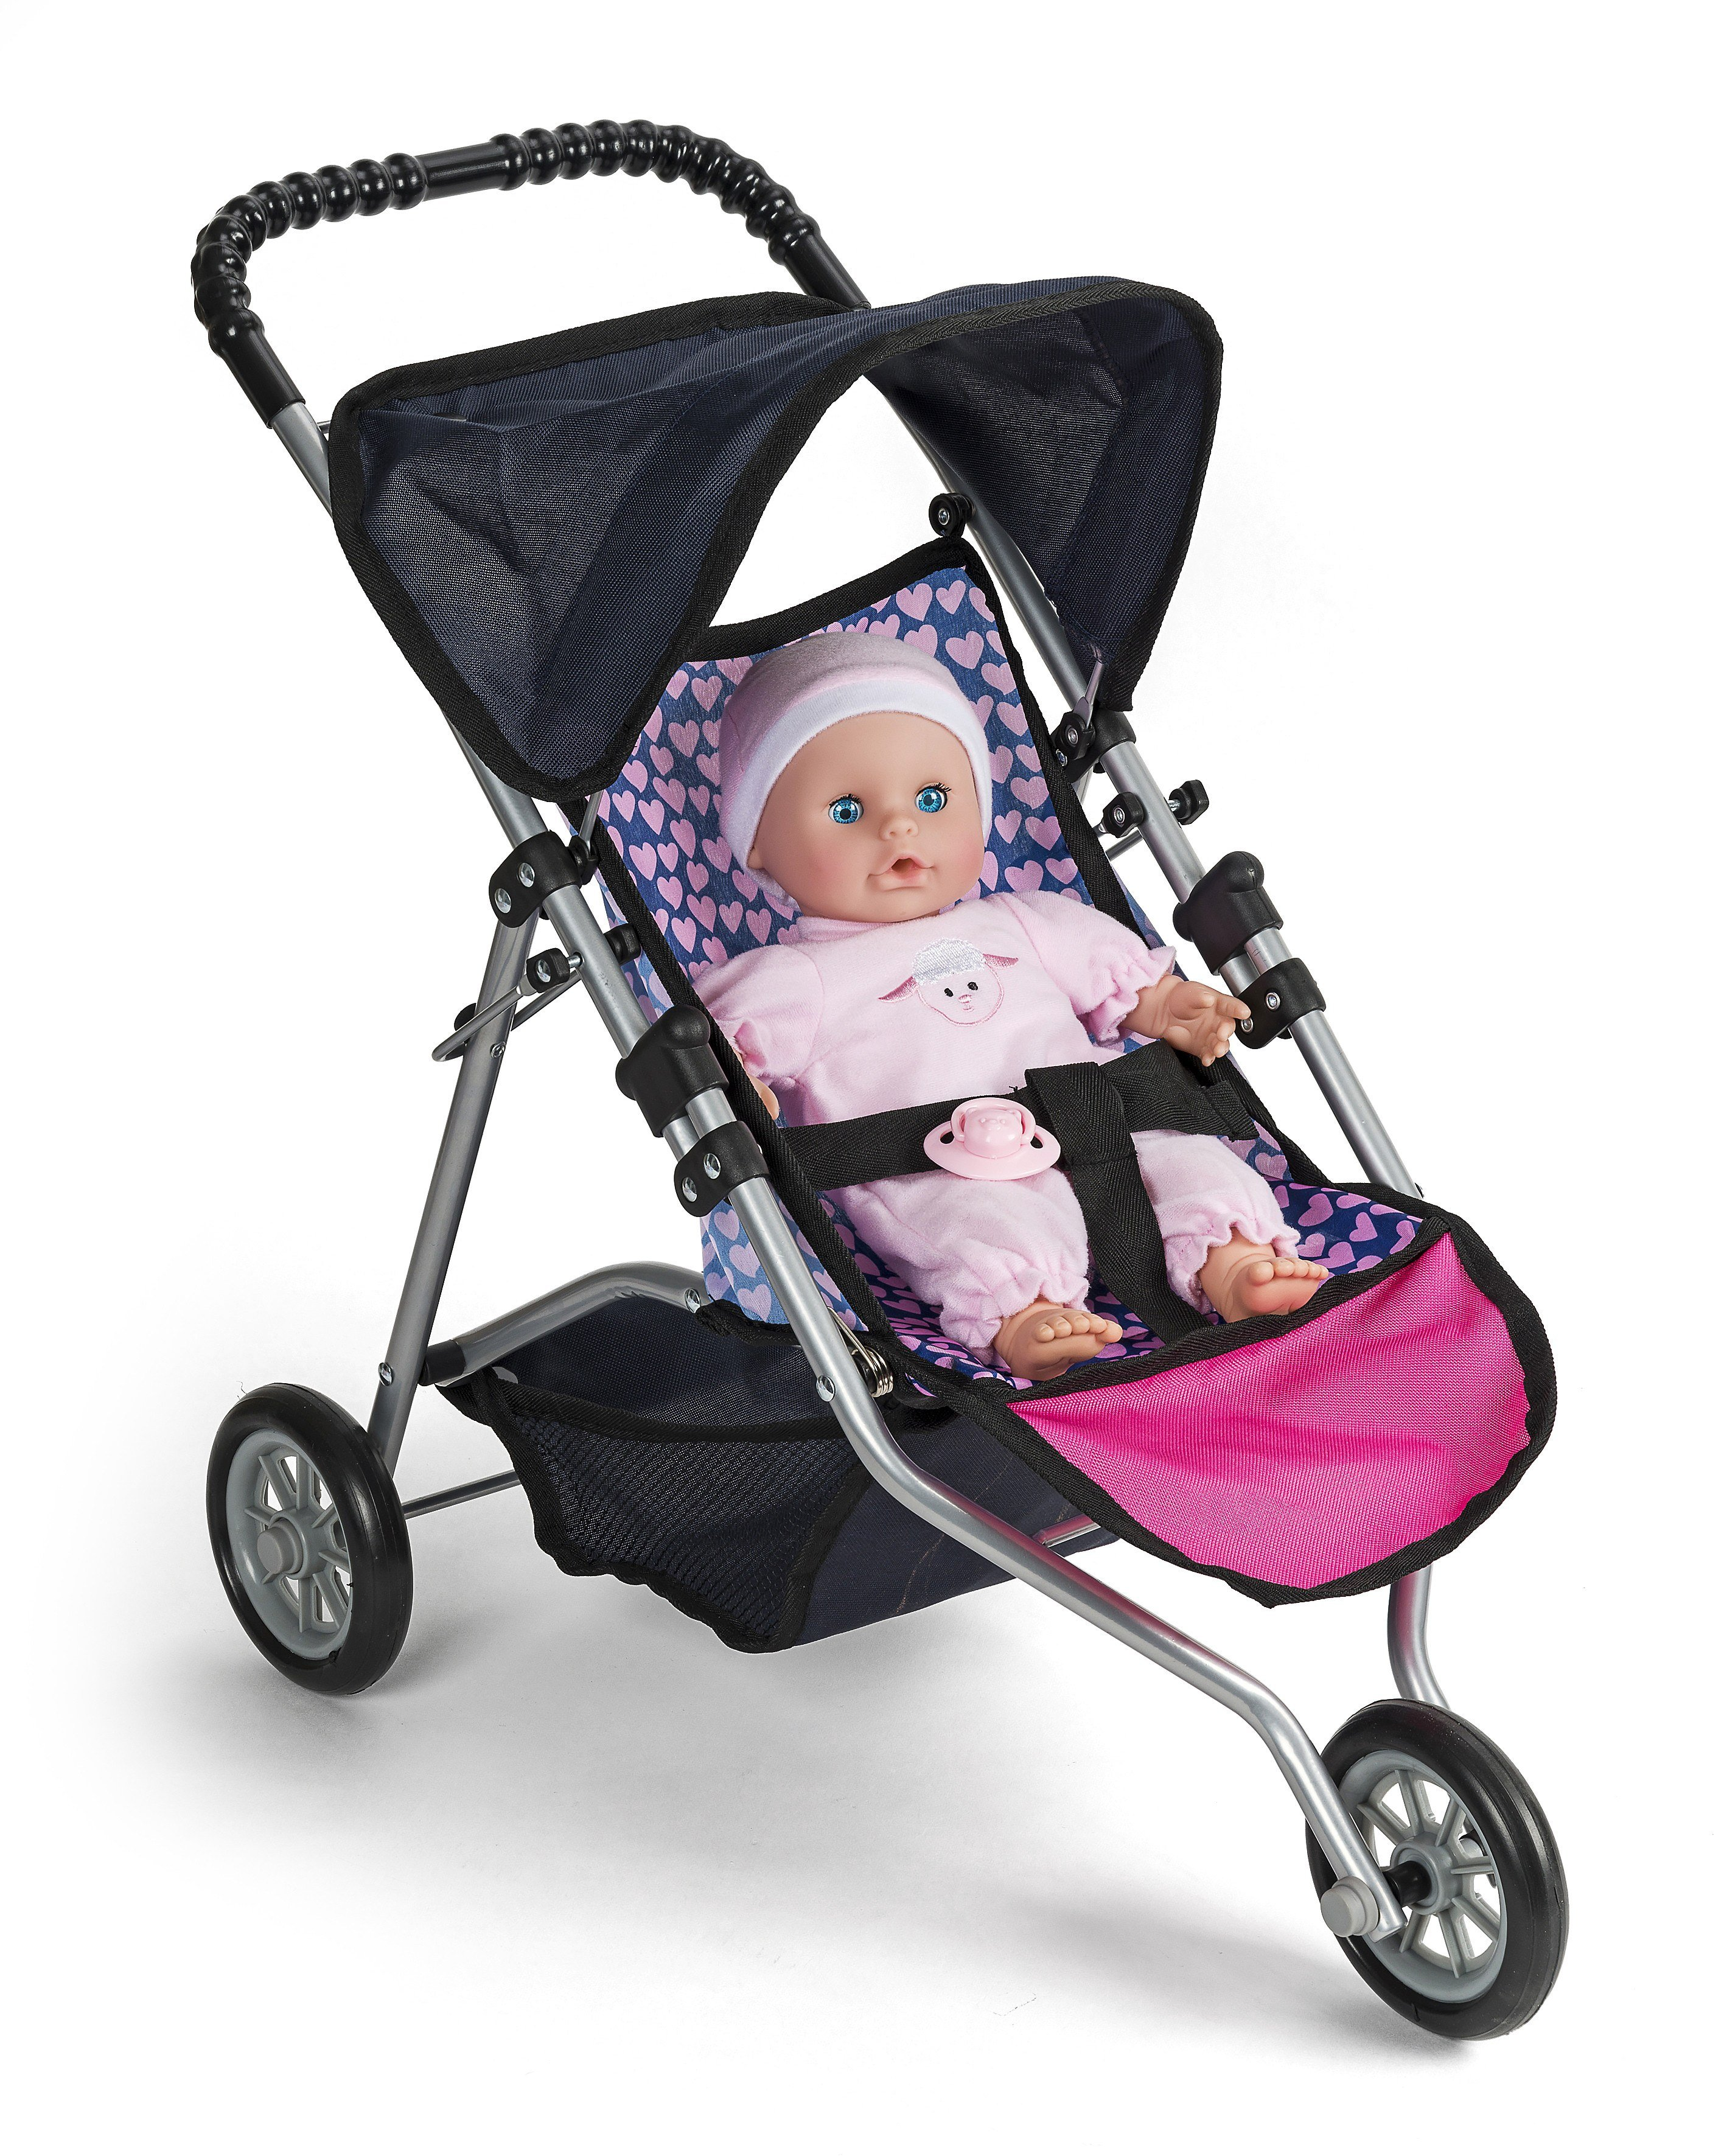 My Baby - Jogging stroller for Dolls (61455)